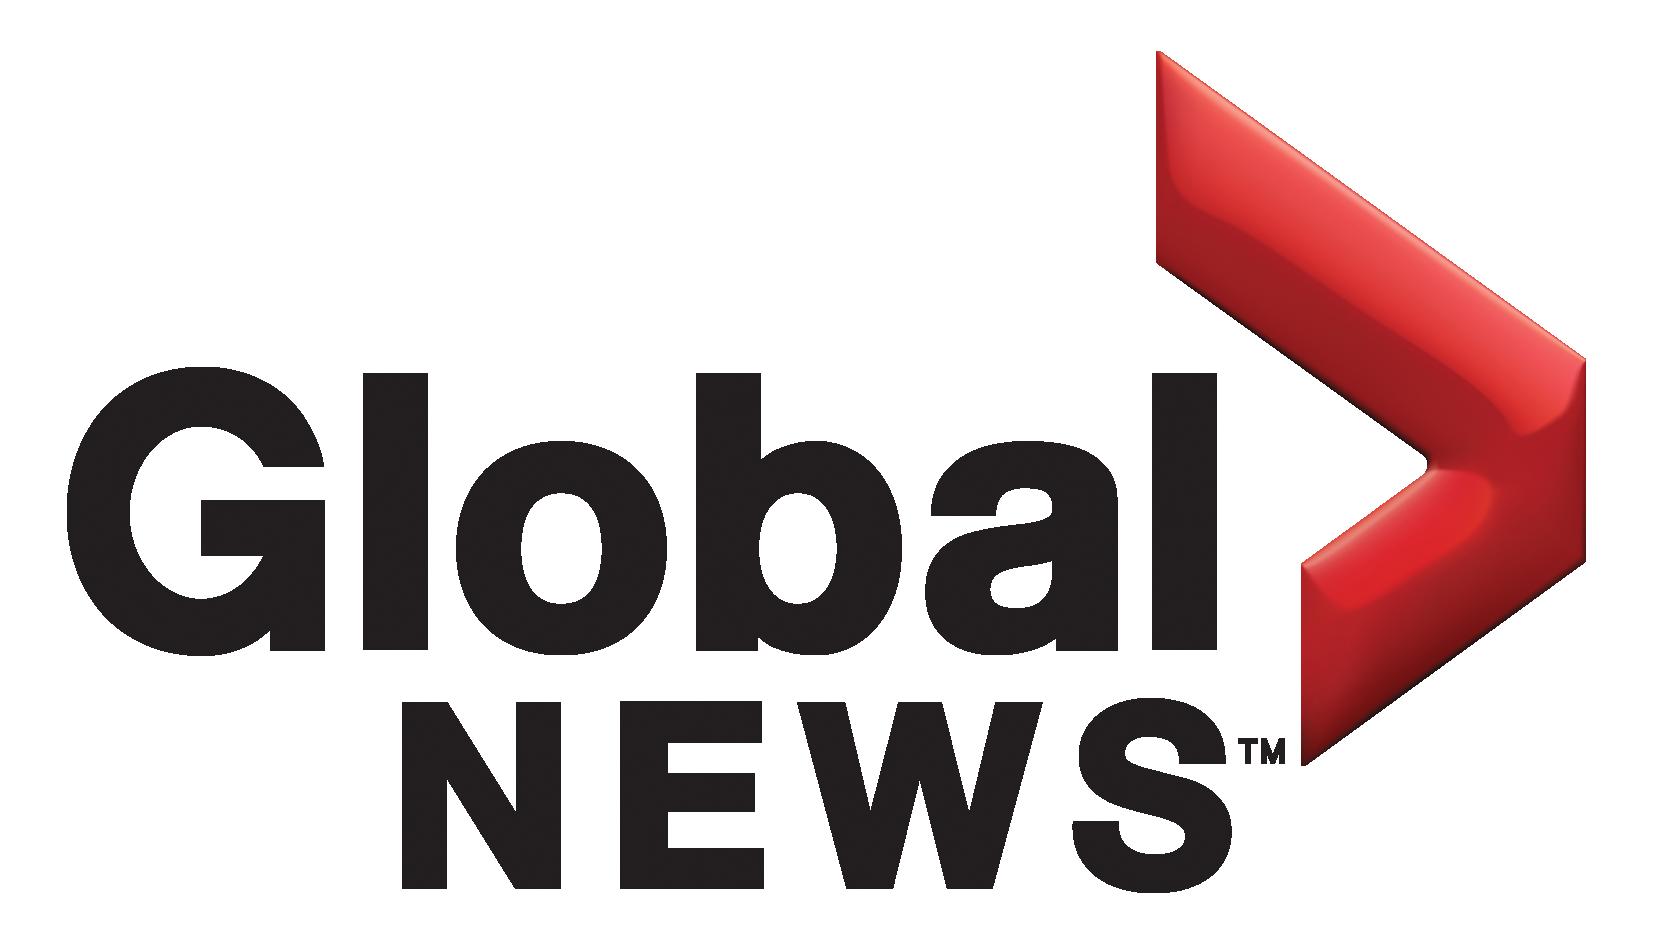 GL_news_logo_pos_TM.png